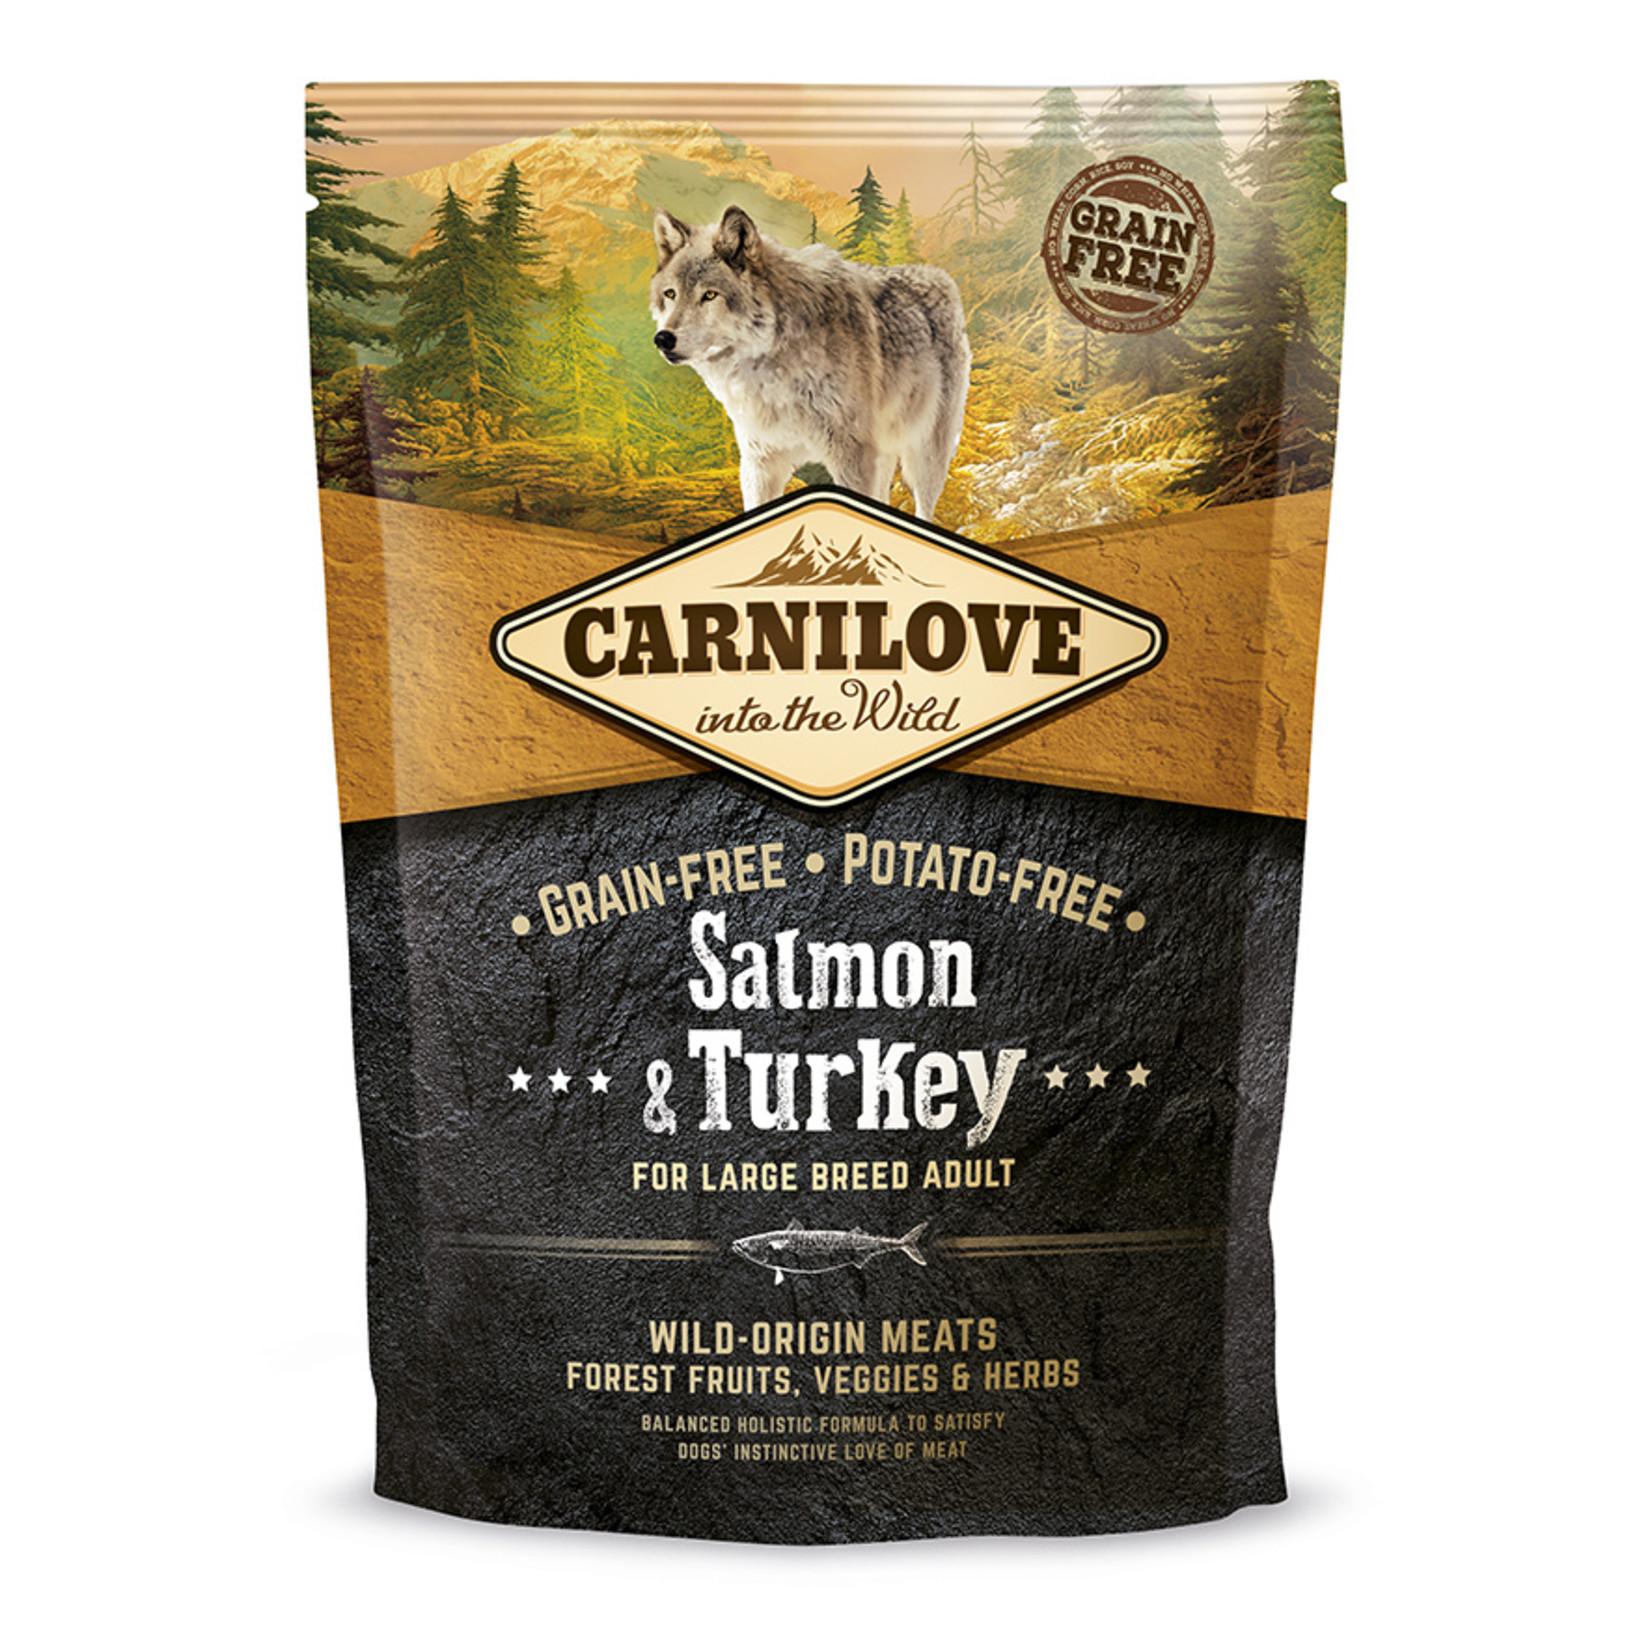 Carnilove Salmon & turkey adult